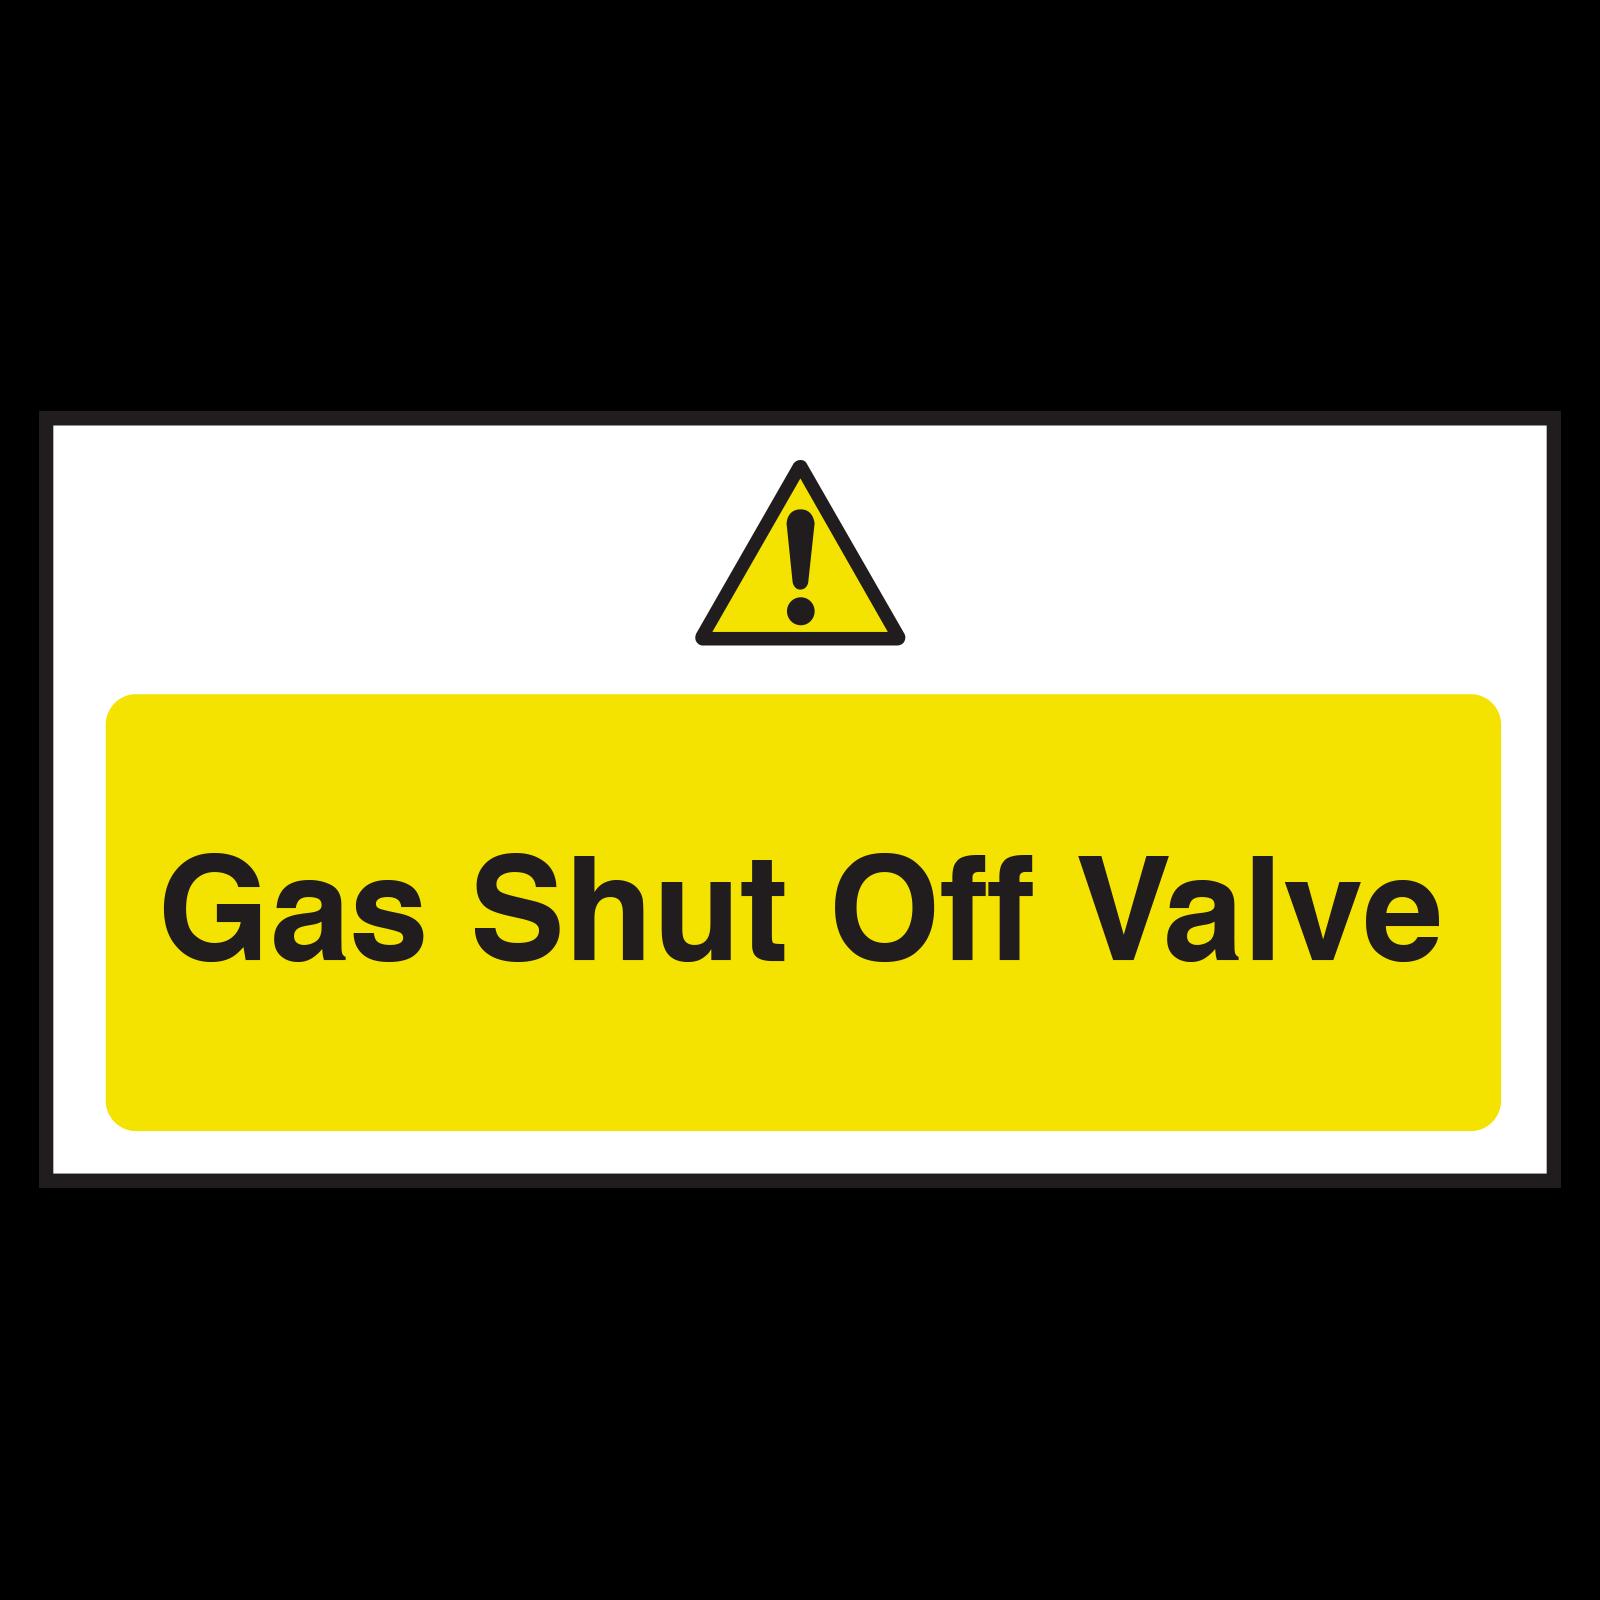 Gas Shut Off Valve Notice